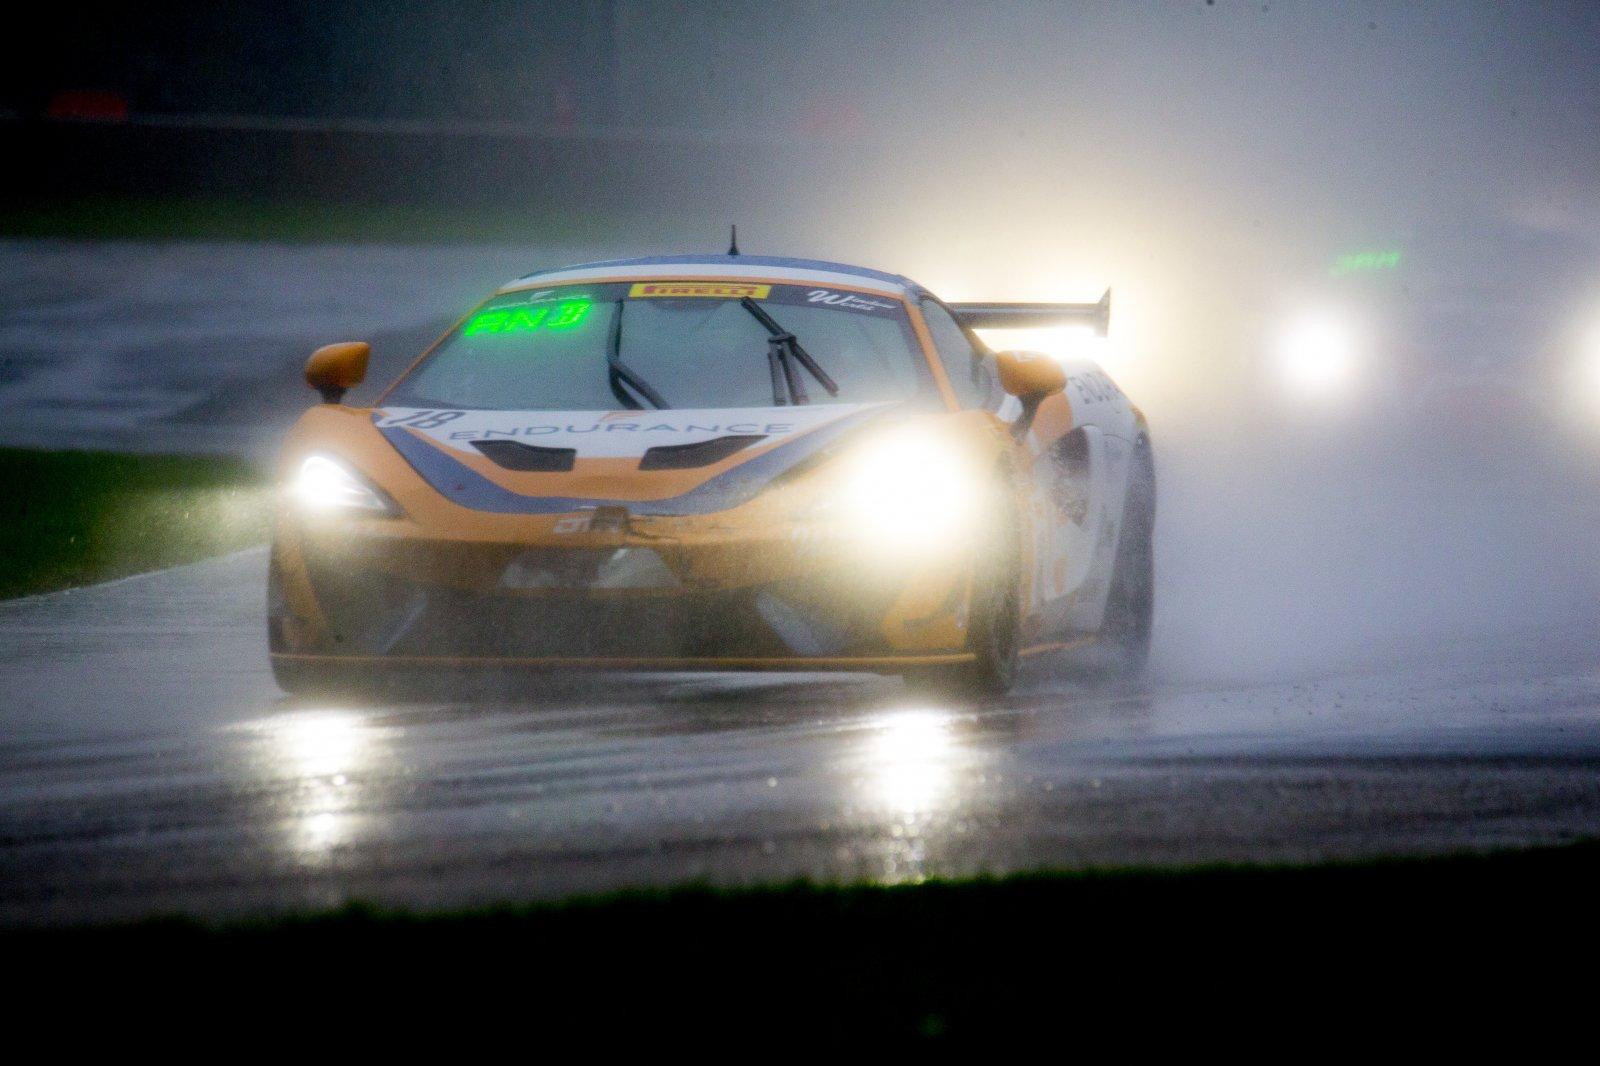 #18 McLaren 570S GT4, Jarett Andretti, Andretti Autosport, SRO Pirelli GT4 America, Road America, September 2019.